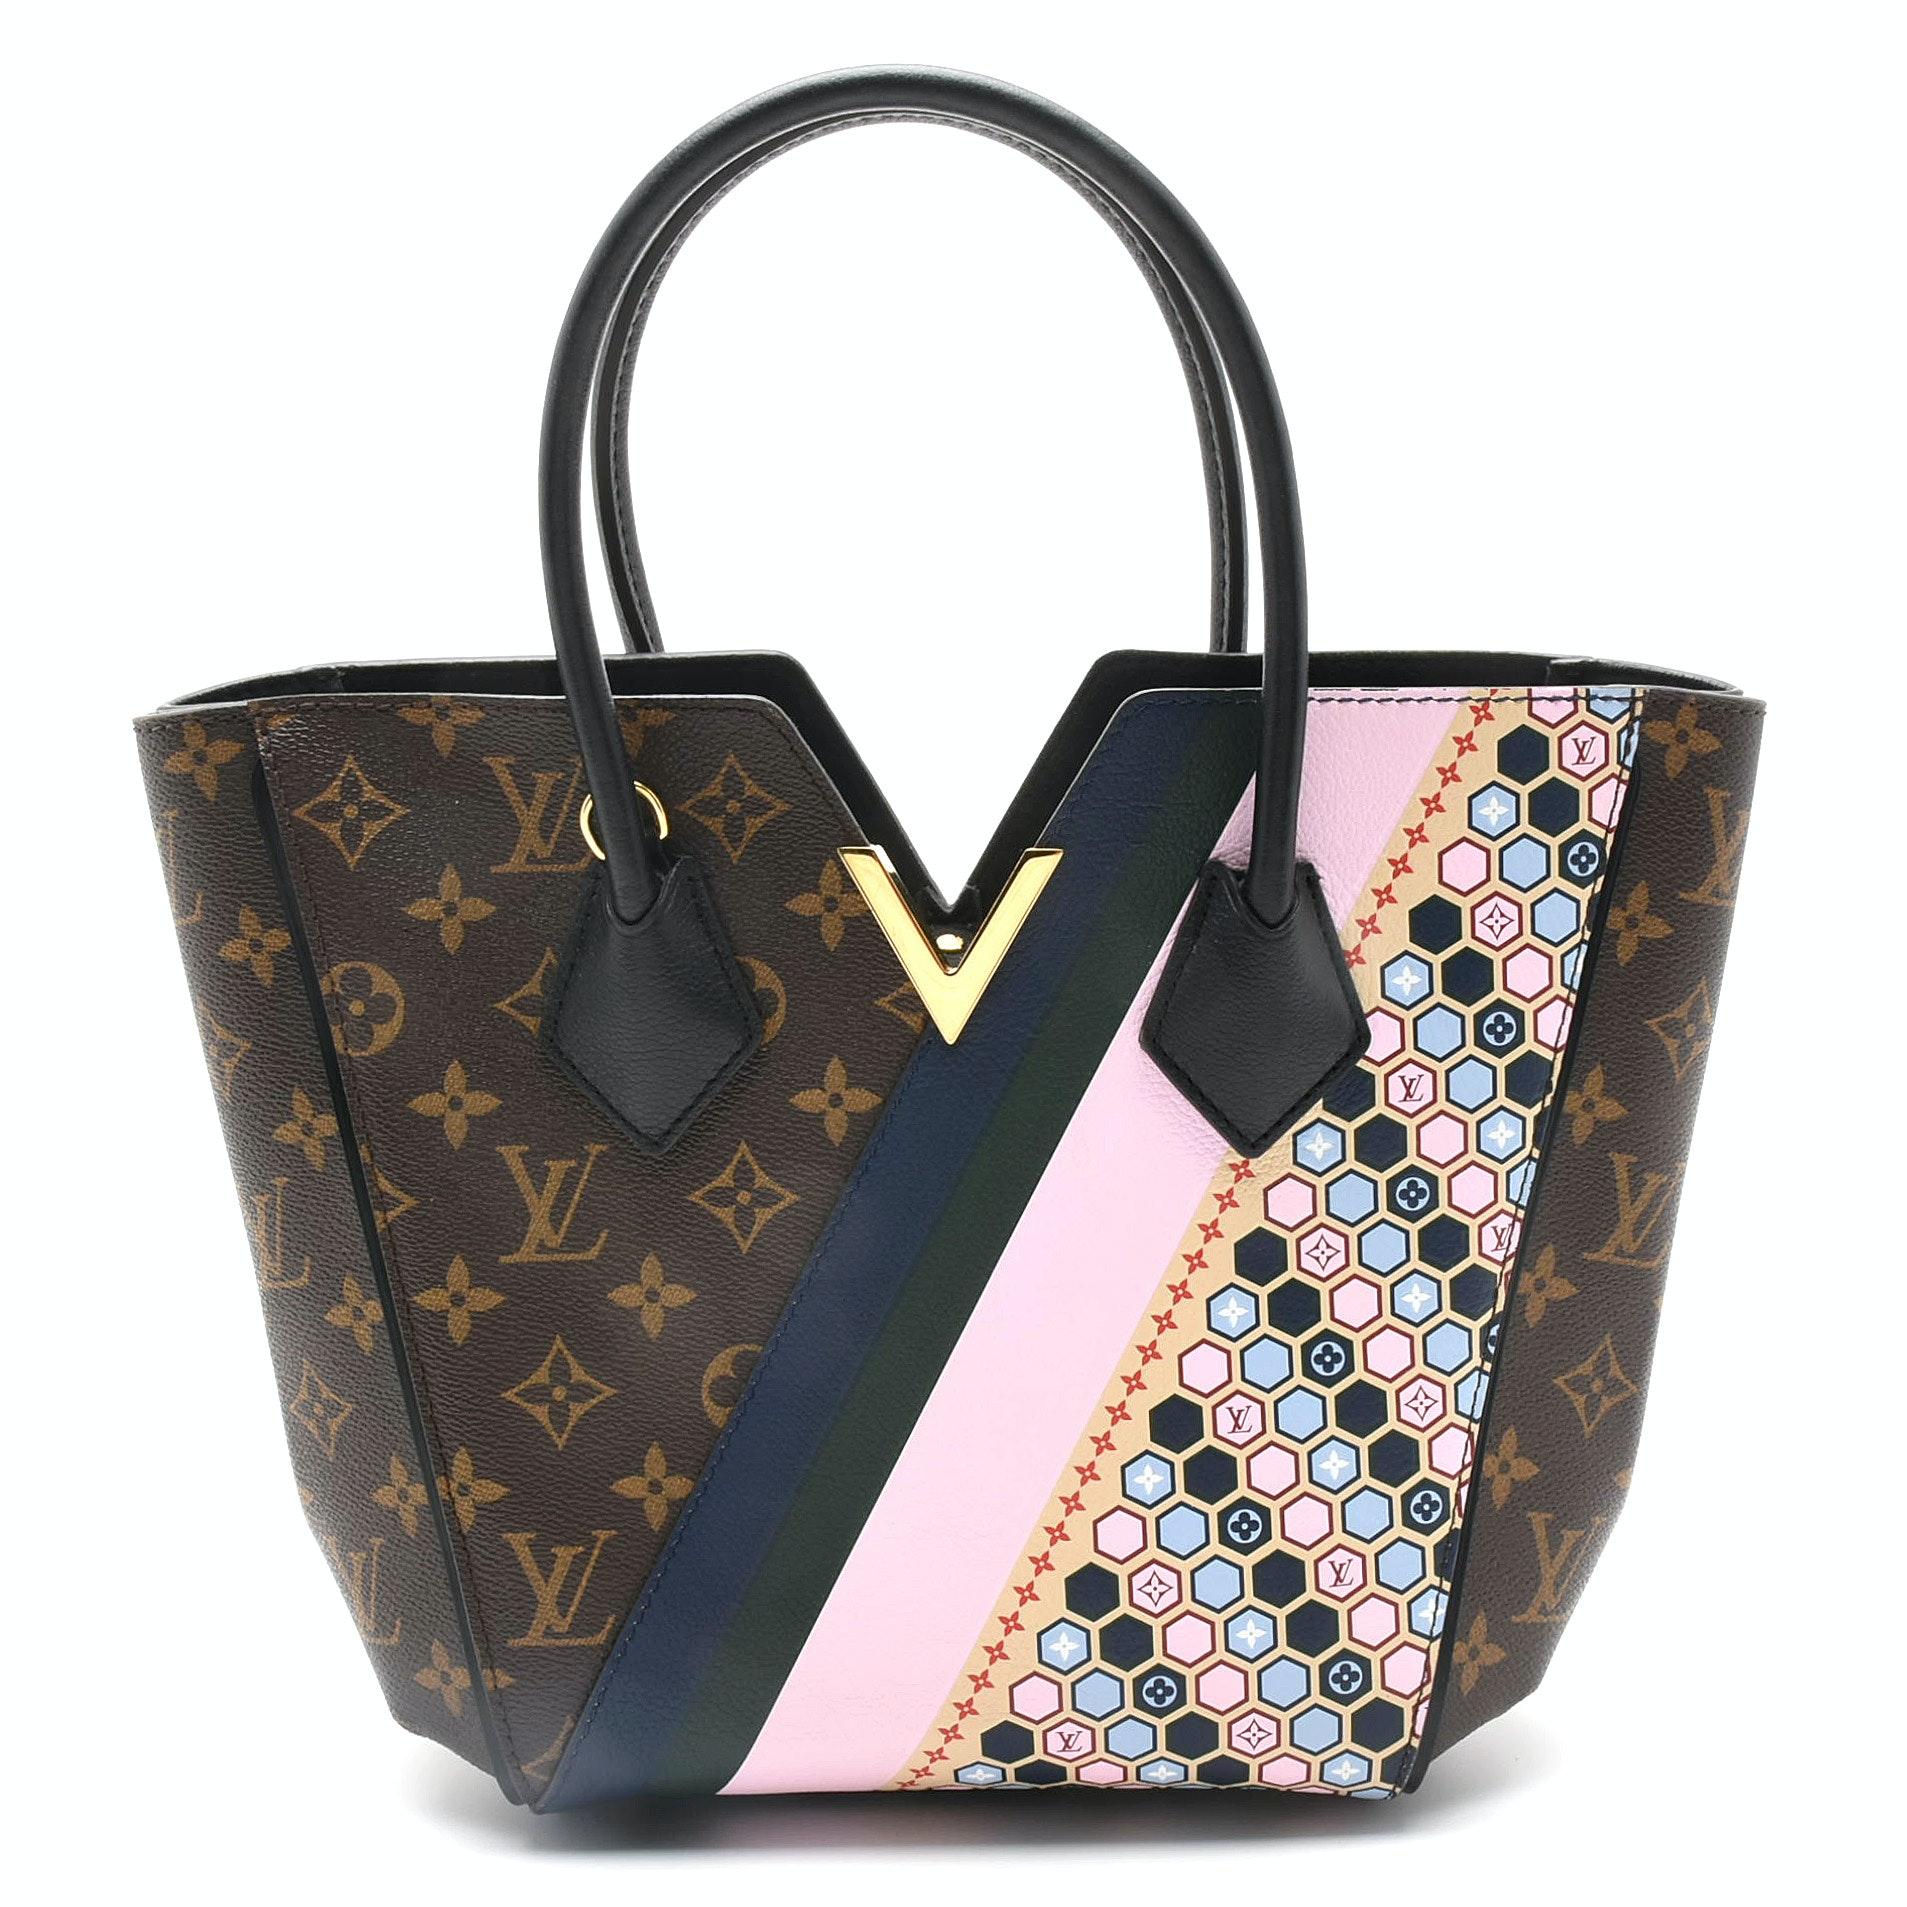 "Louis Vuitton Cruise 2017 Limited Edition Monogram Canvas ""Kimono"" PM Bag"